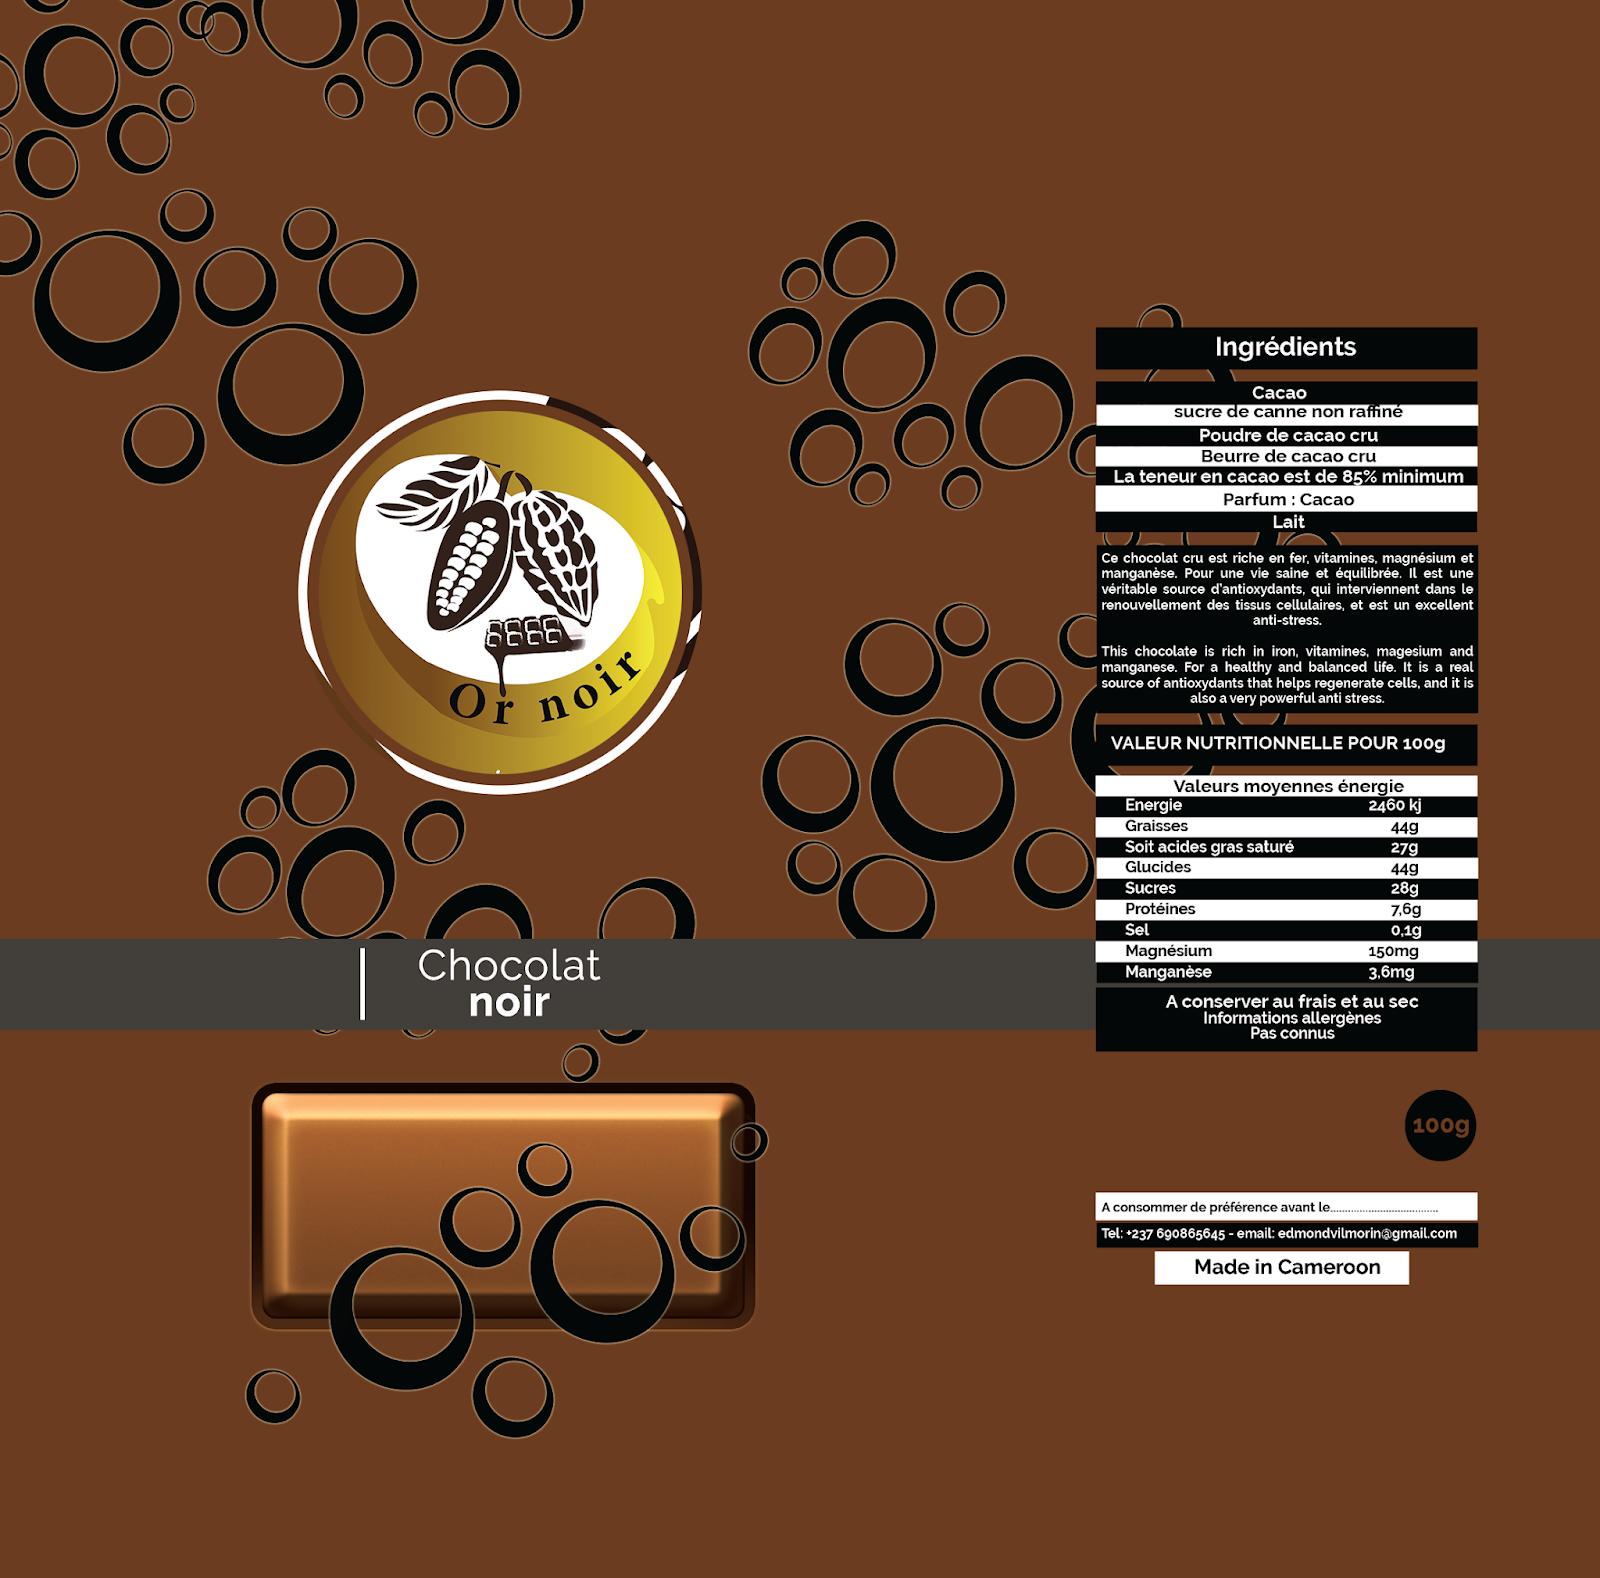 Chocolat noir - Or noir